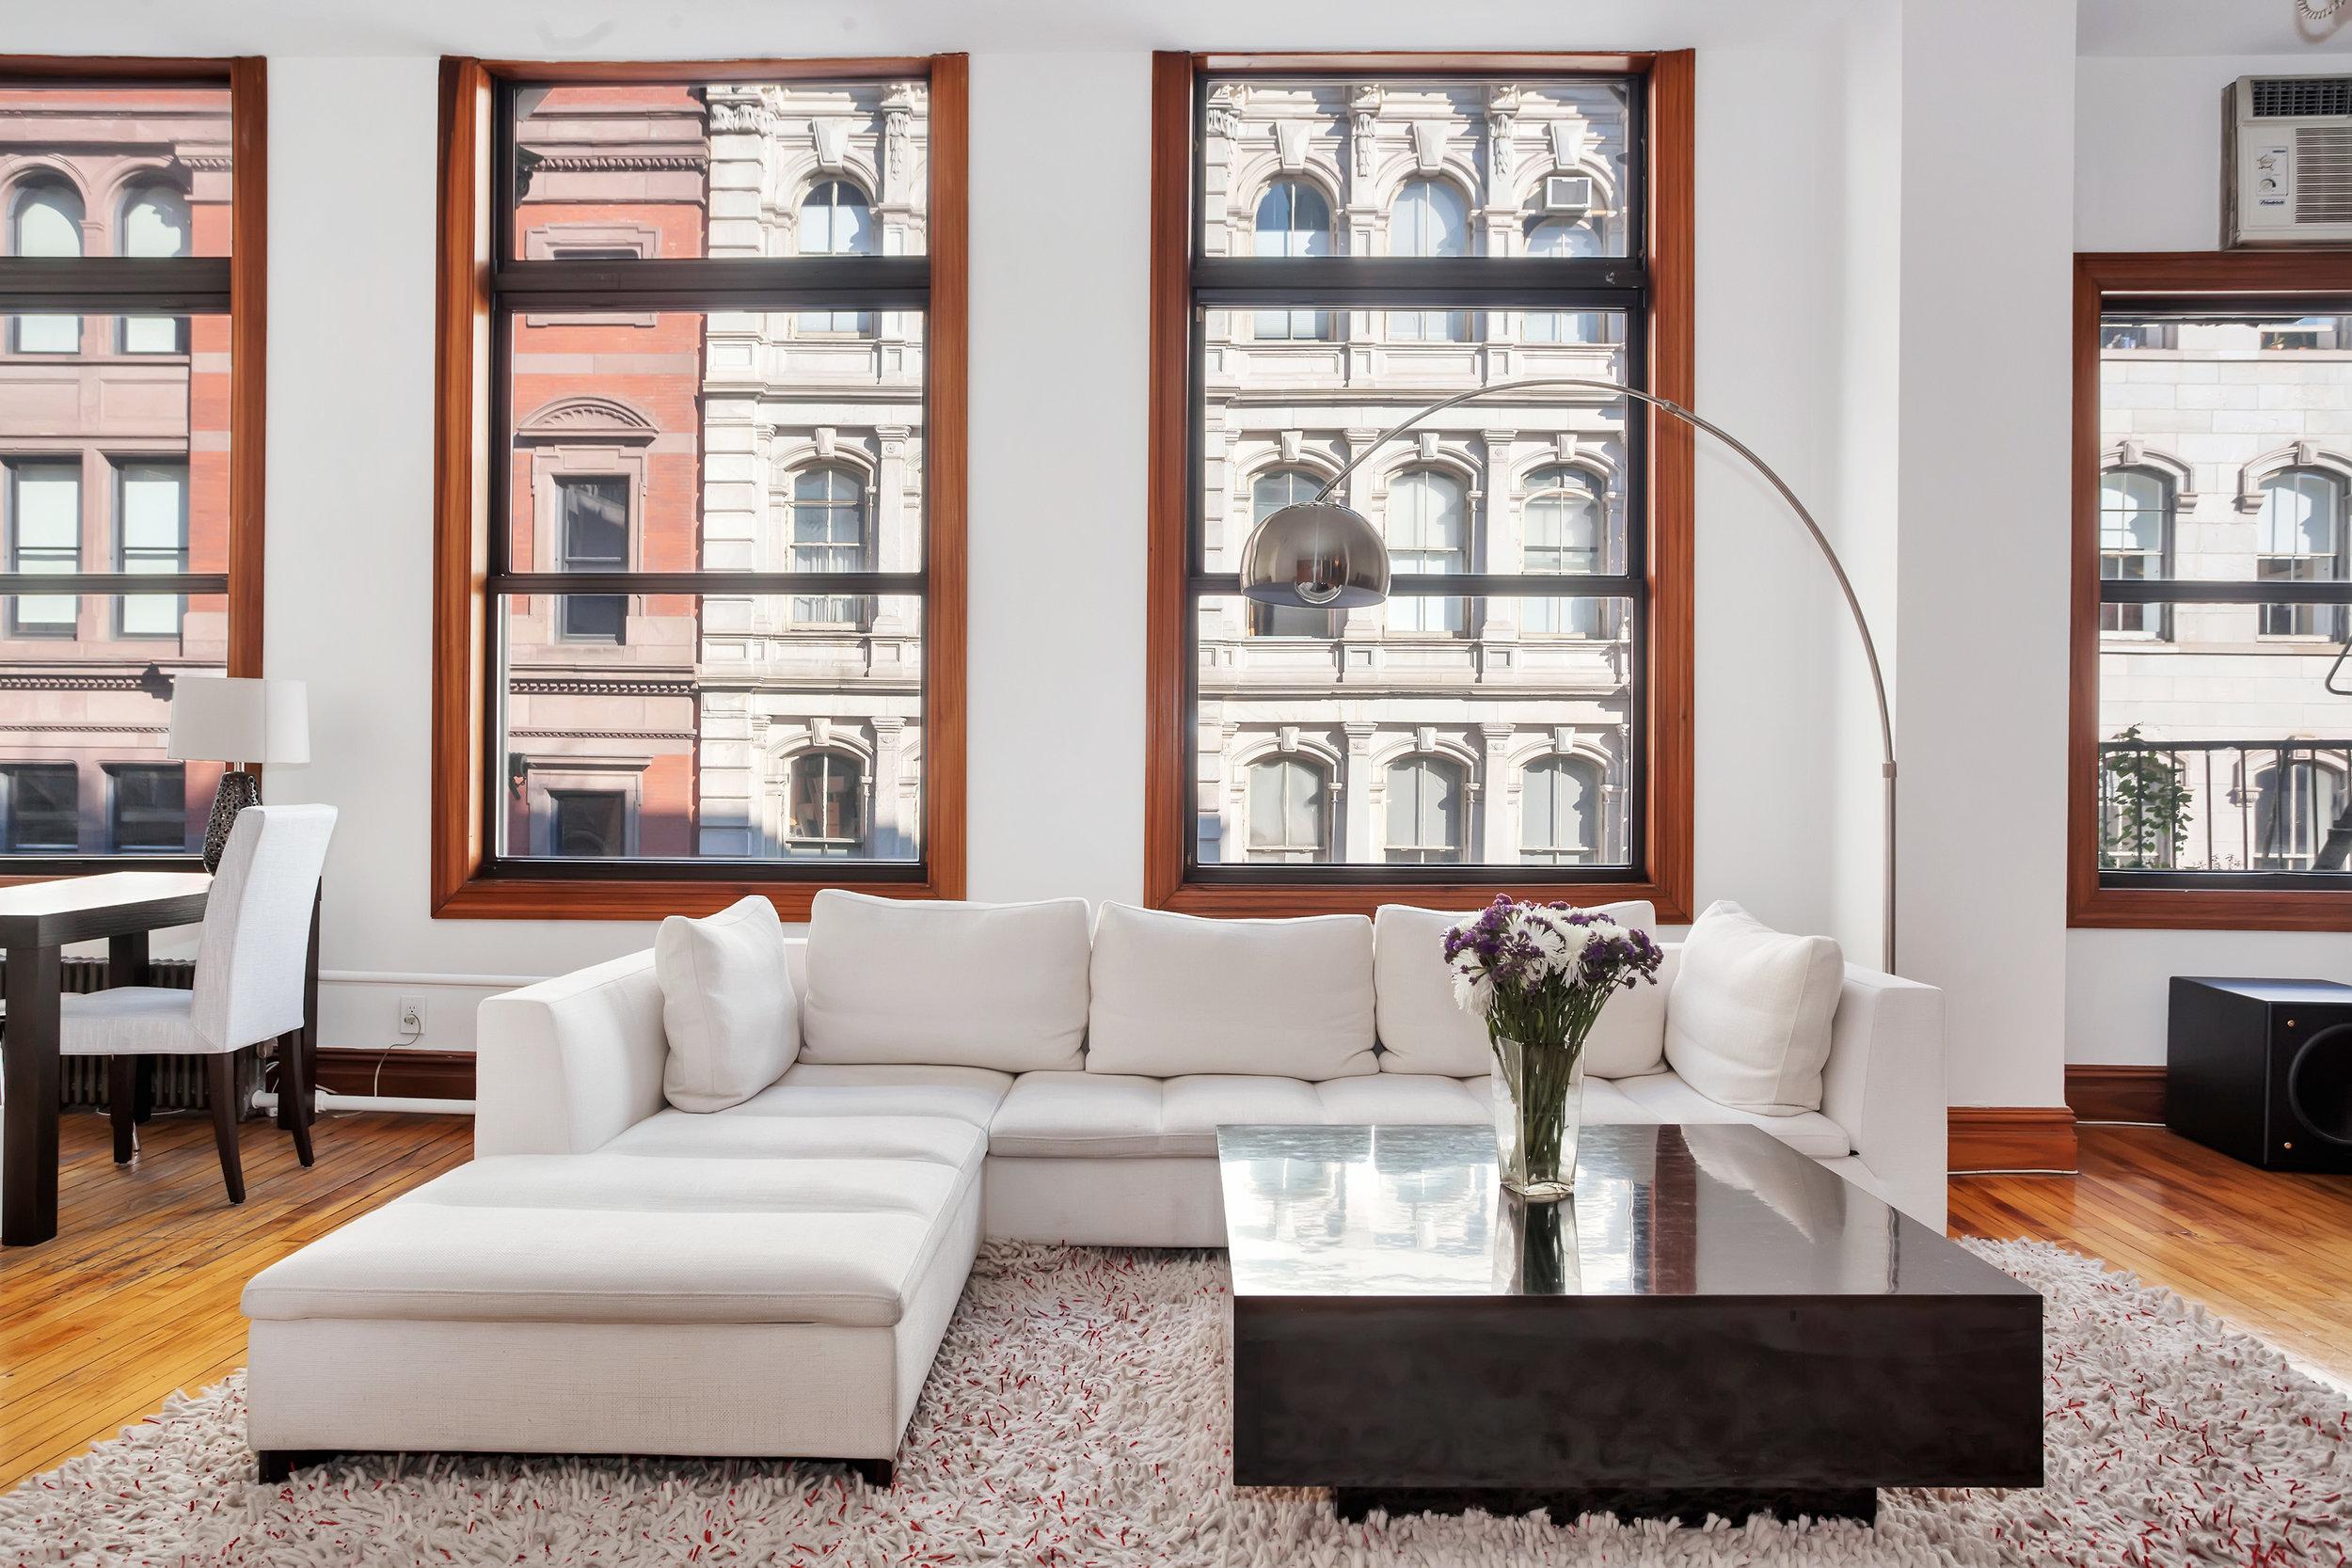 18 East 18th Street, Unit 4W - $3,000,000